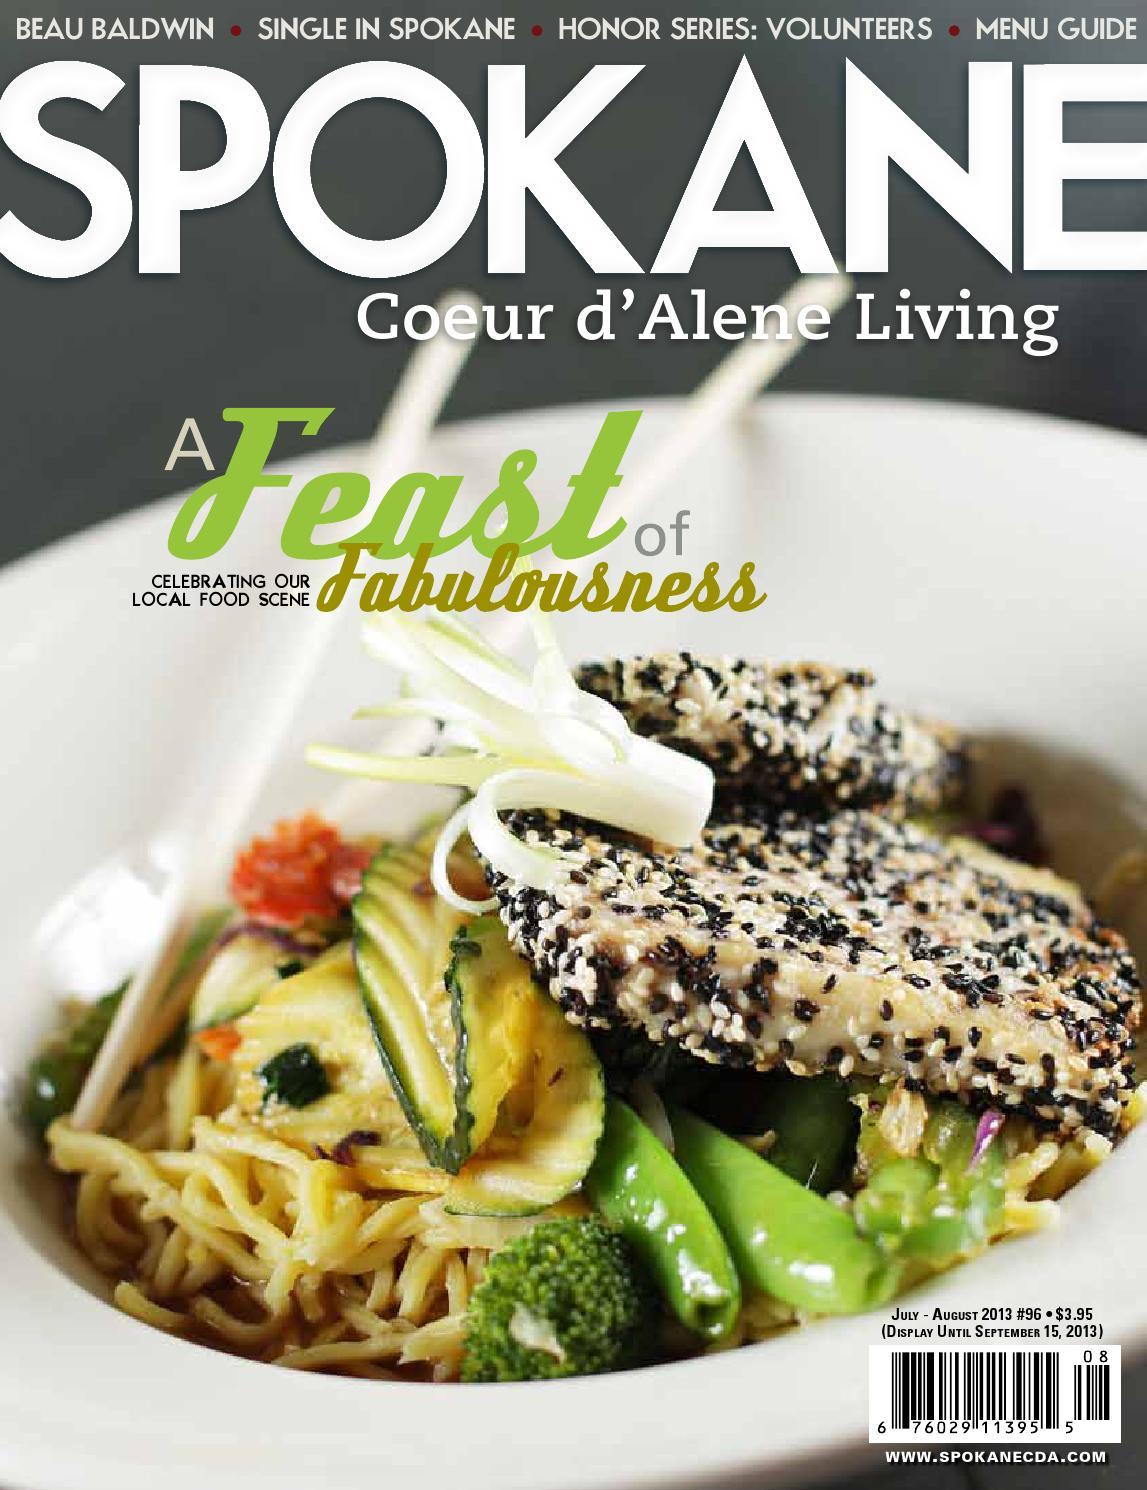 Spokane Coeur D Alene Living Magazine 96 By David Crary